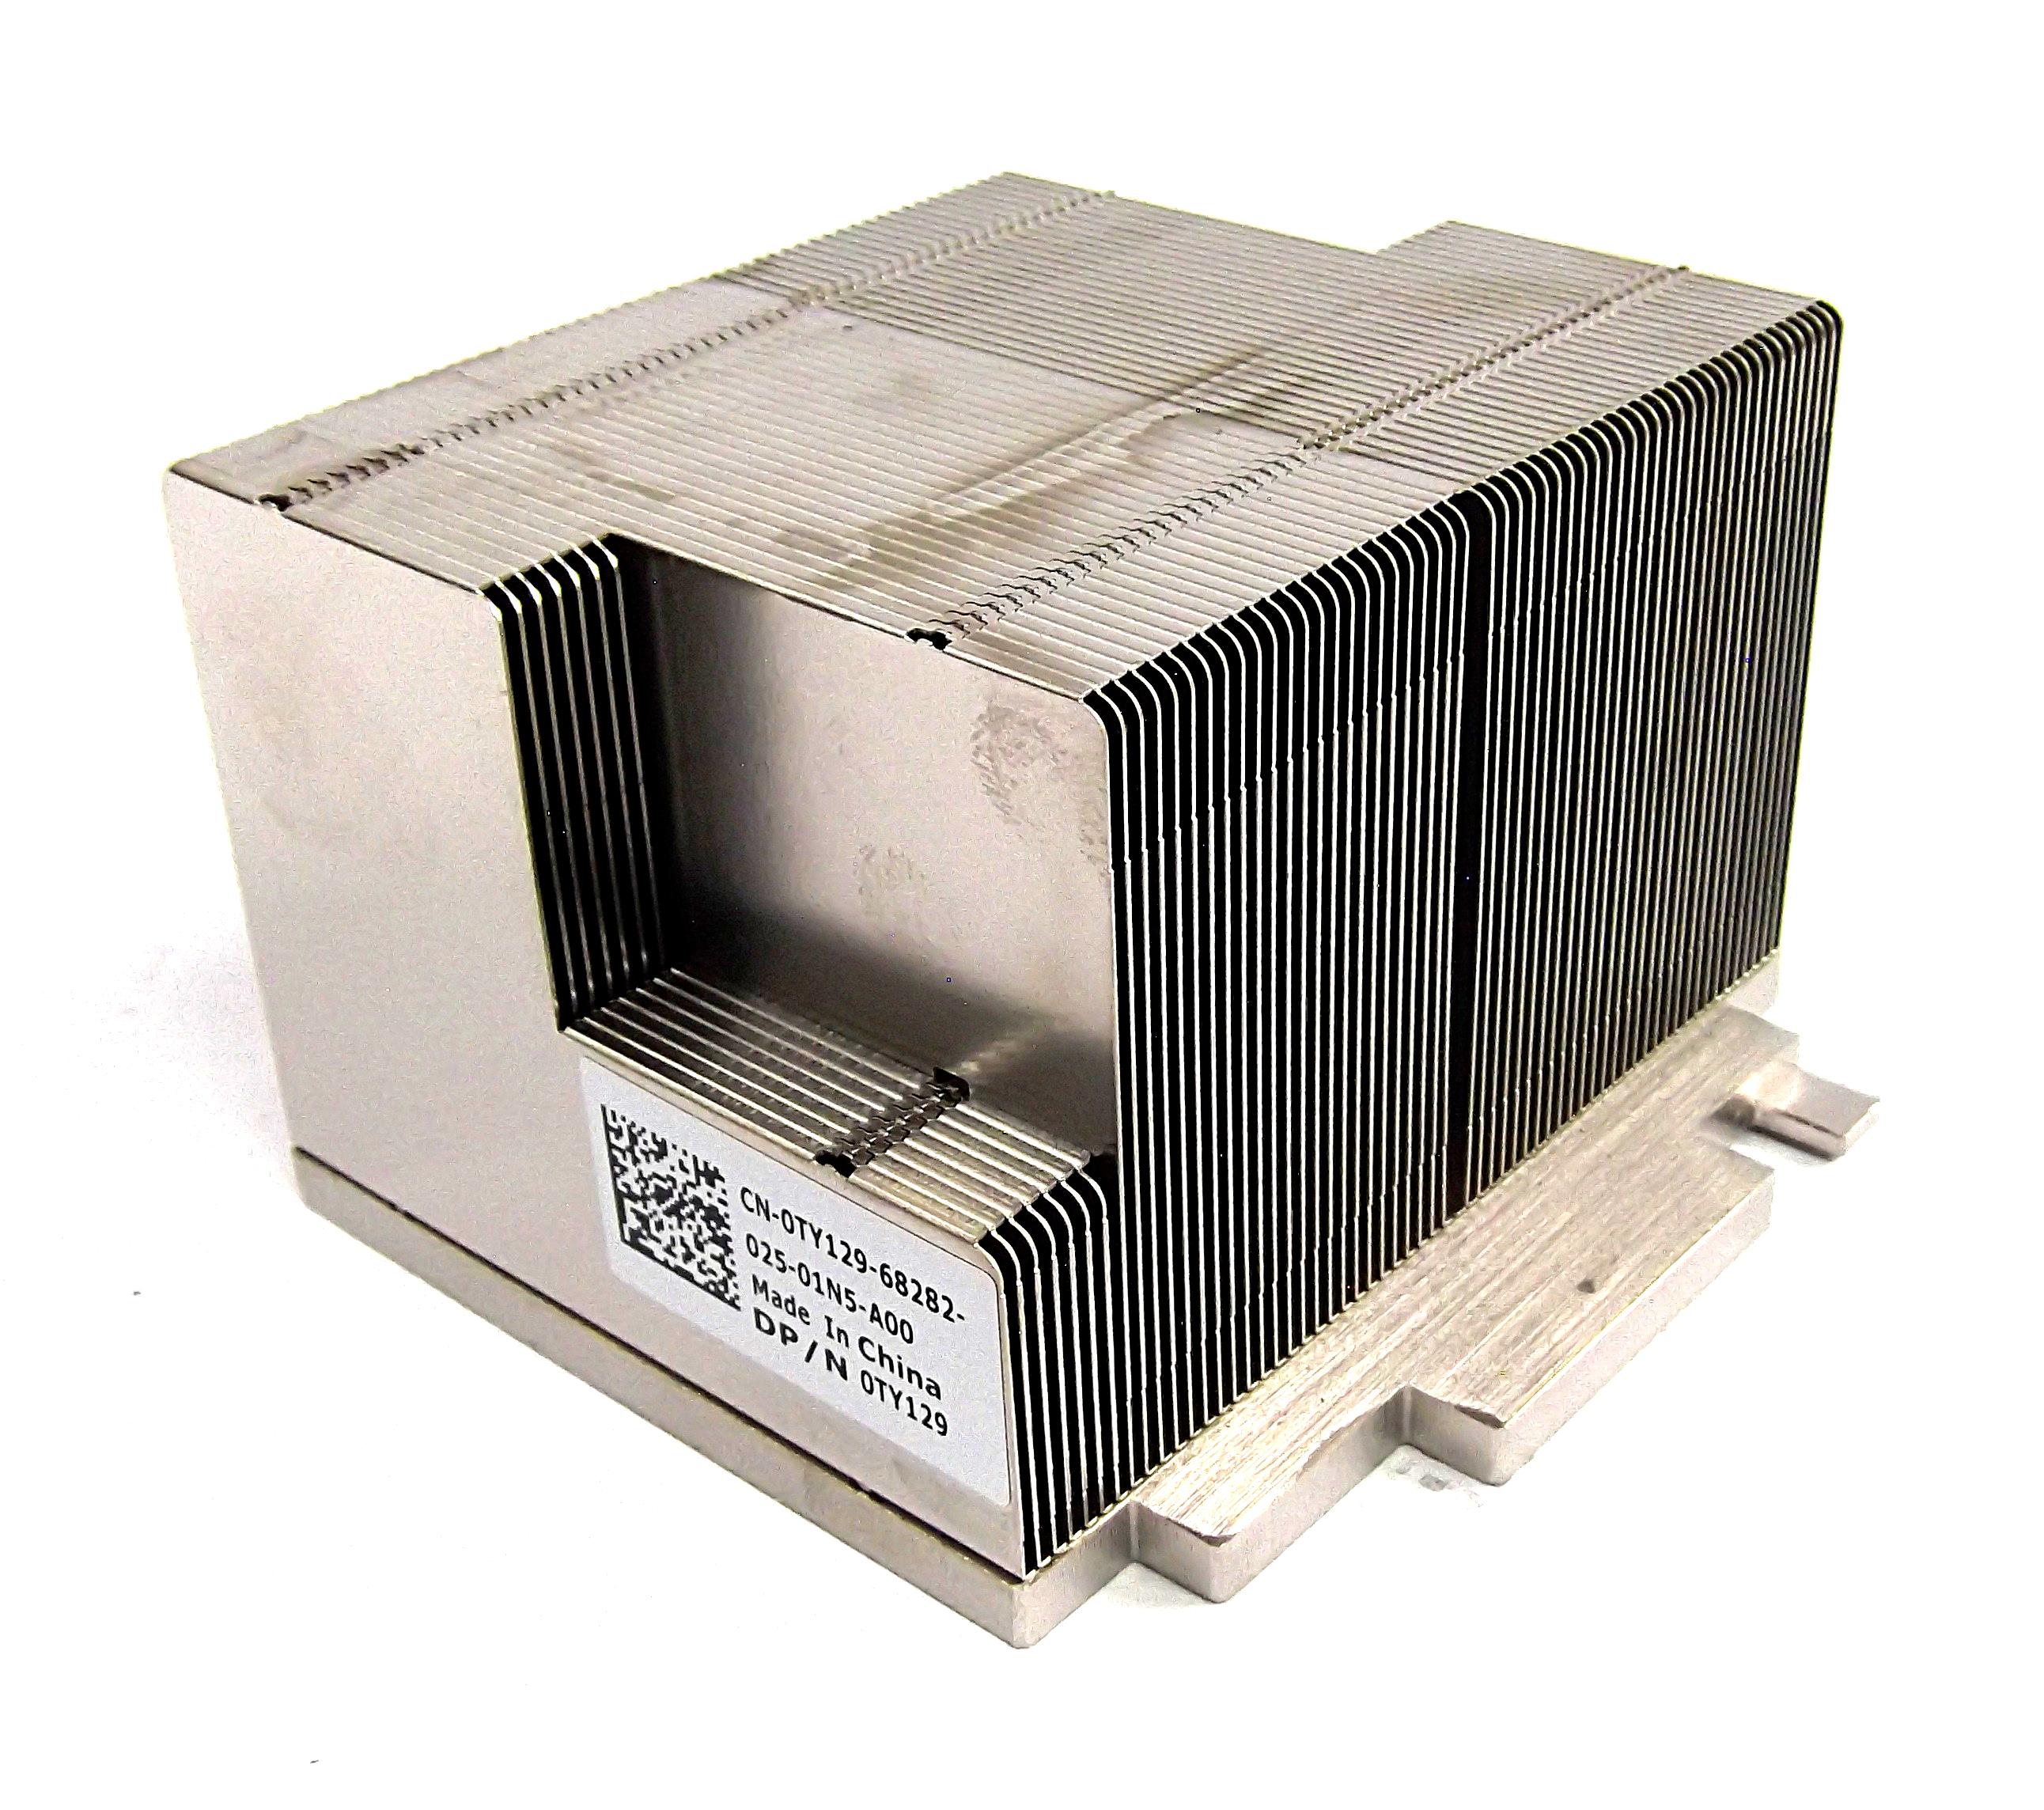 Dell TY129 PowerEdge R710 CPU Heatsink